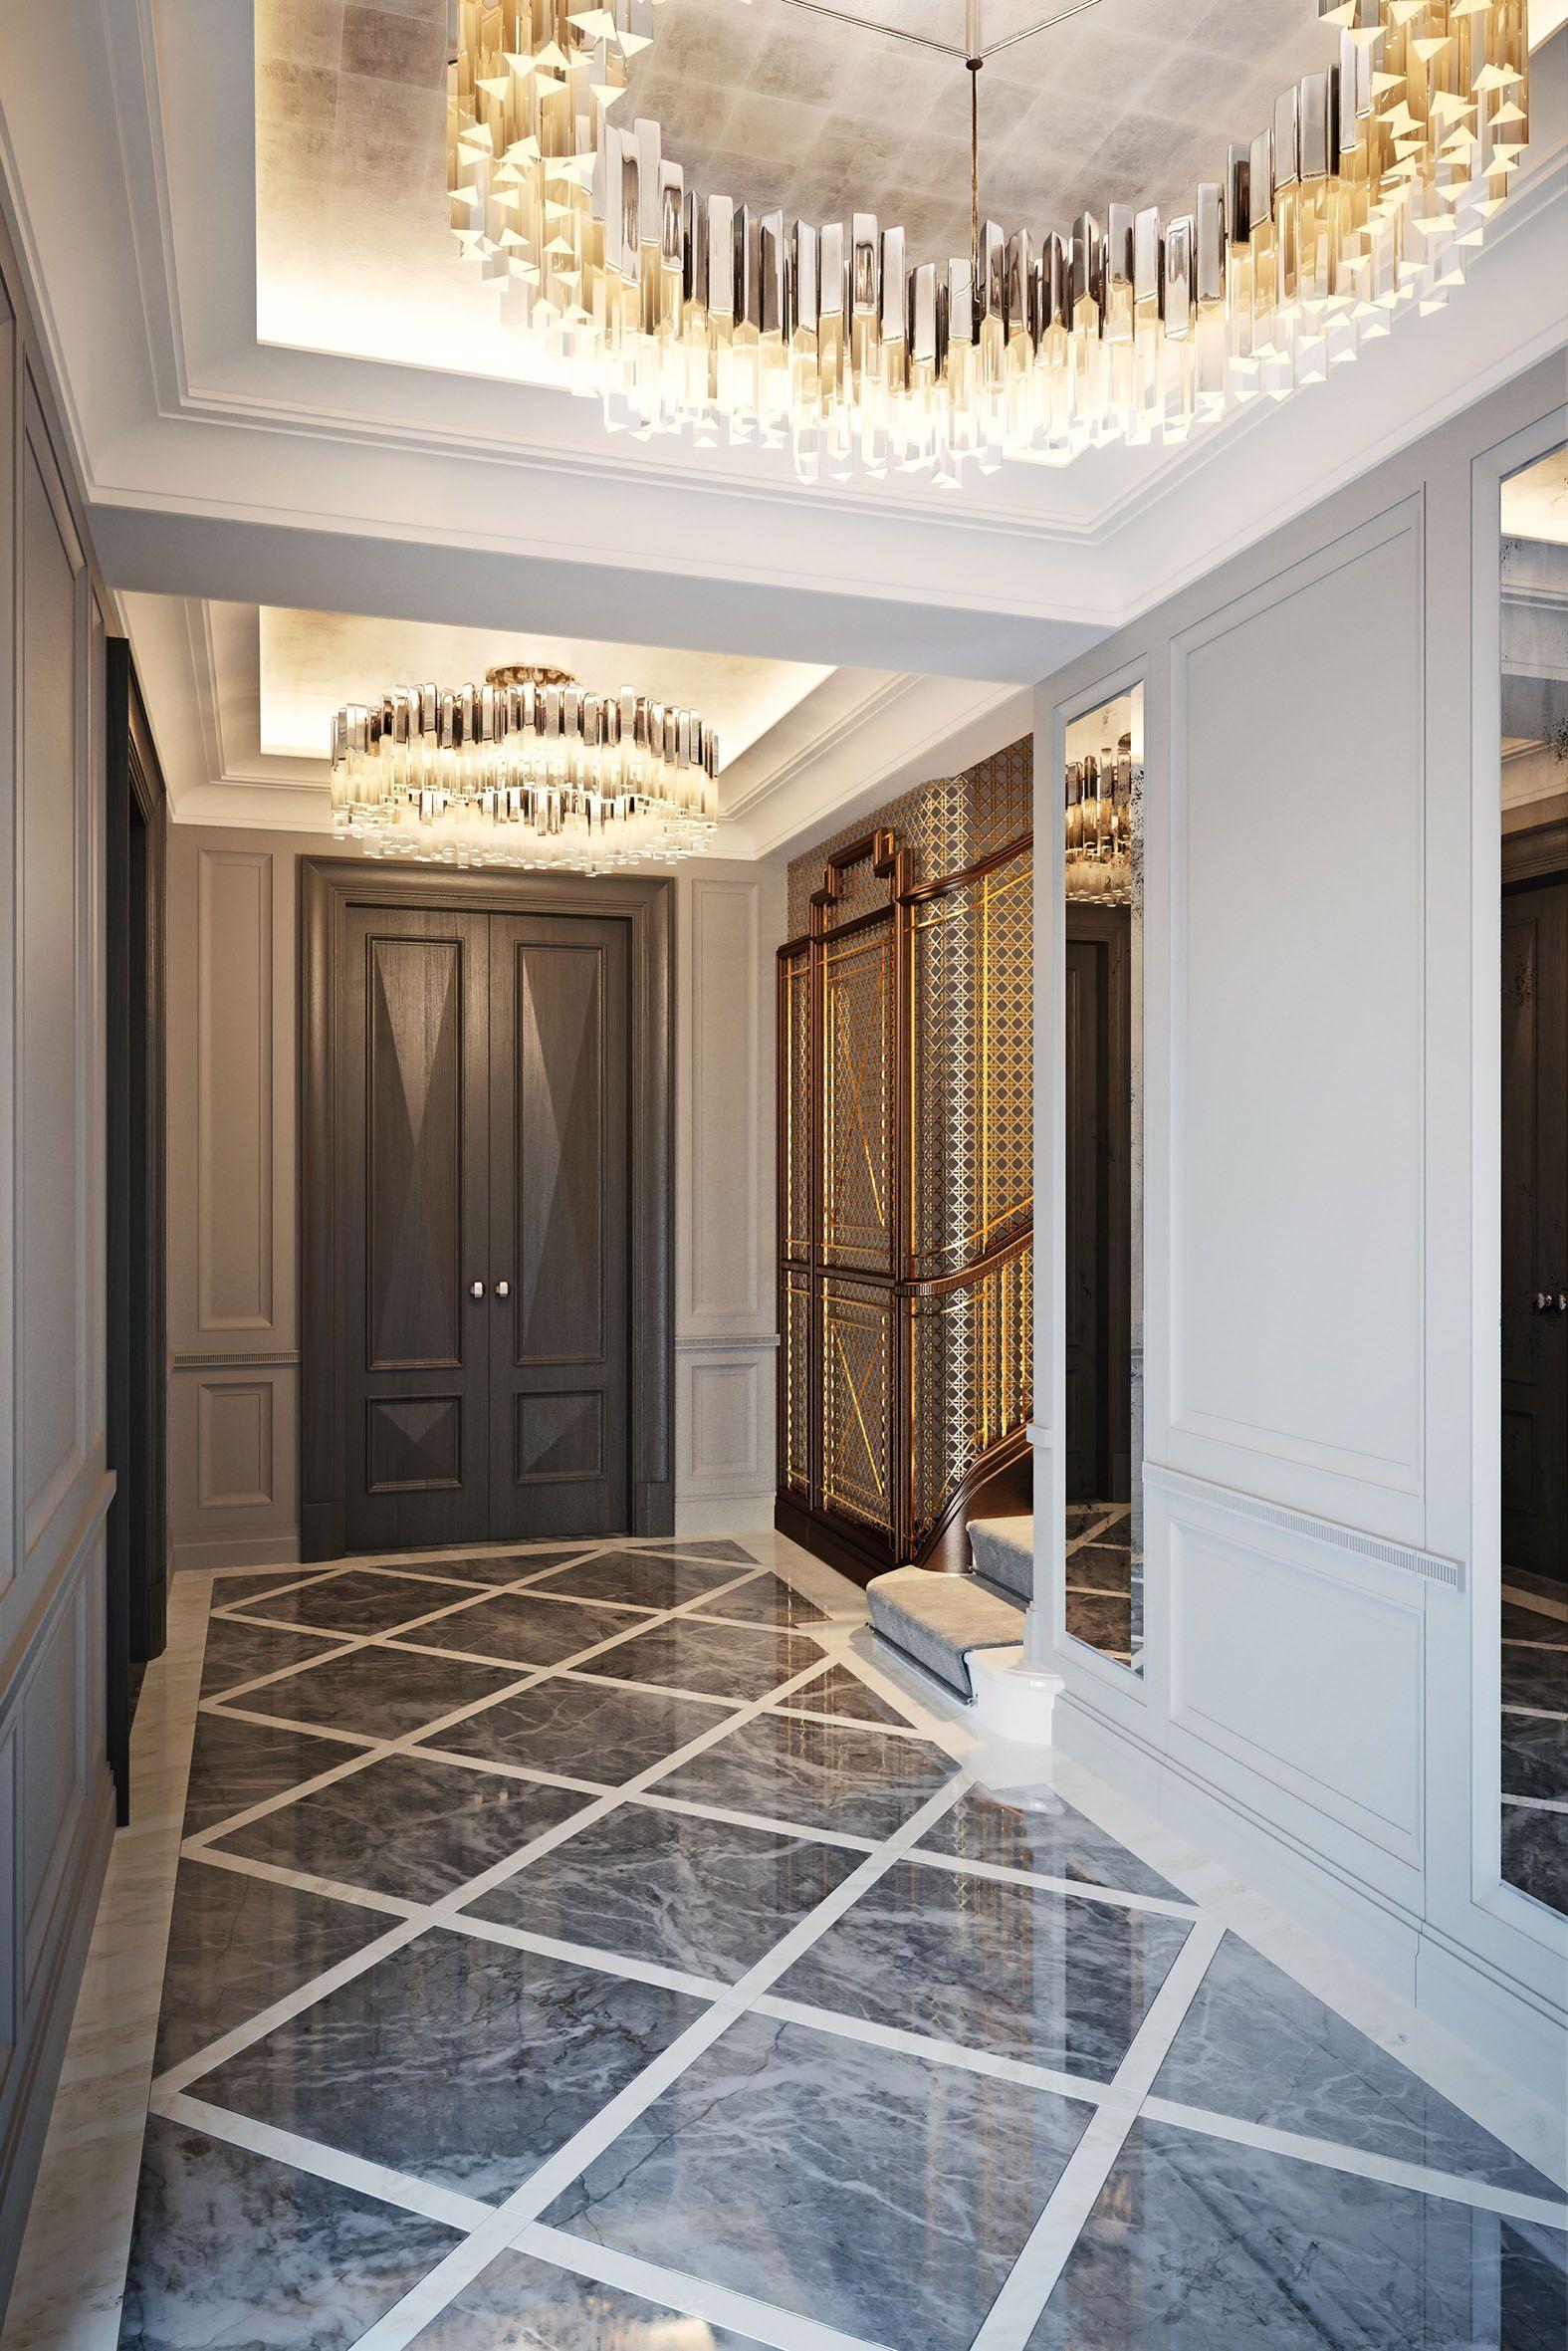 Entrance hall villa la vague morpheus london interiors